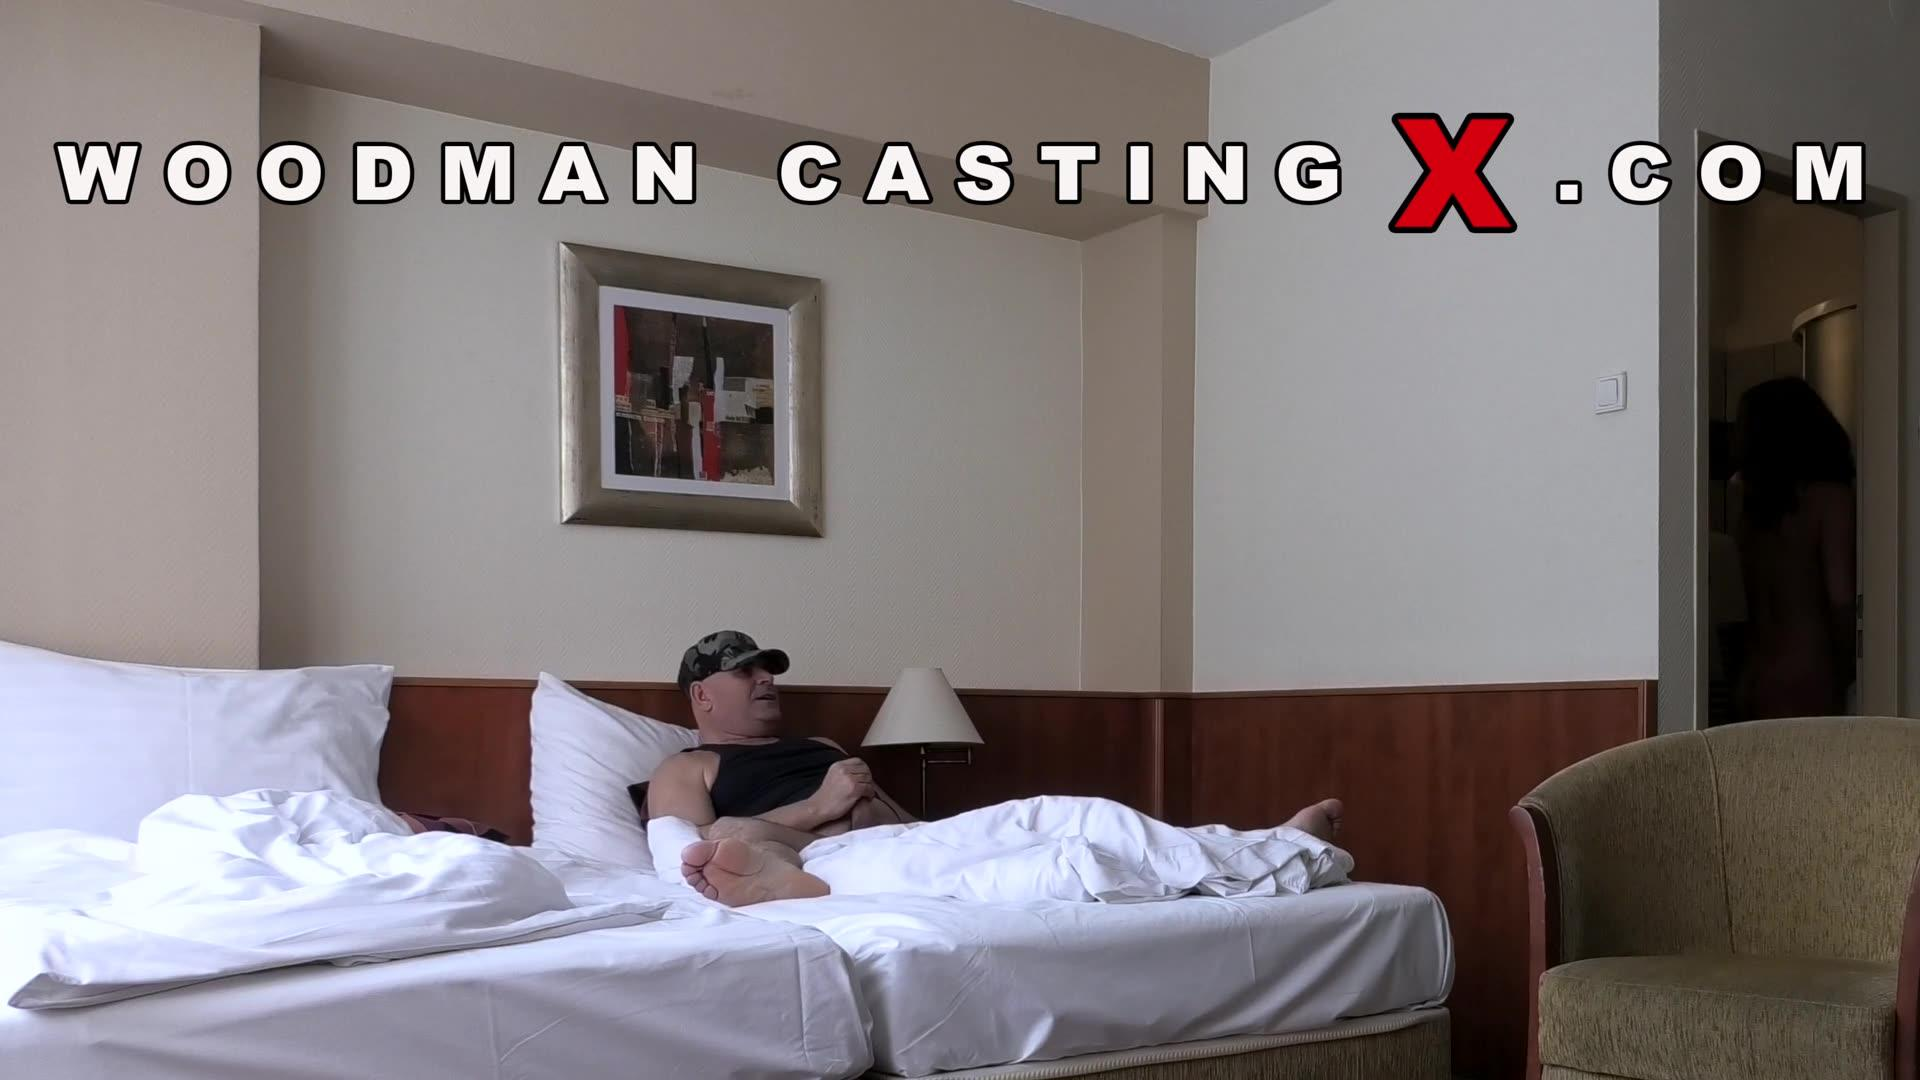 WoodmanCastingX 20 10 15 Alessandra Amore Casting X 205 Updated XXX 1080p MP4-XXX